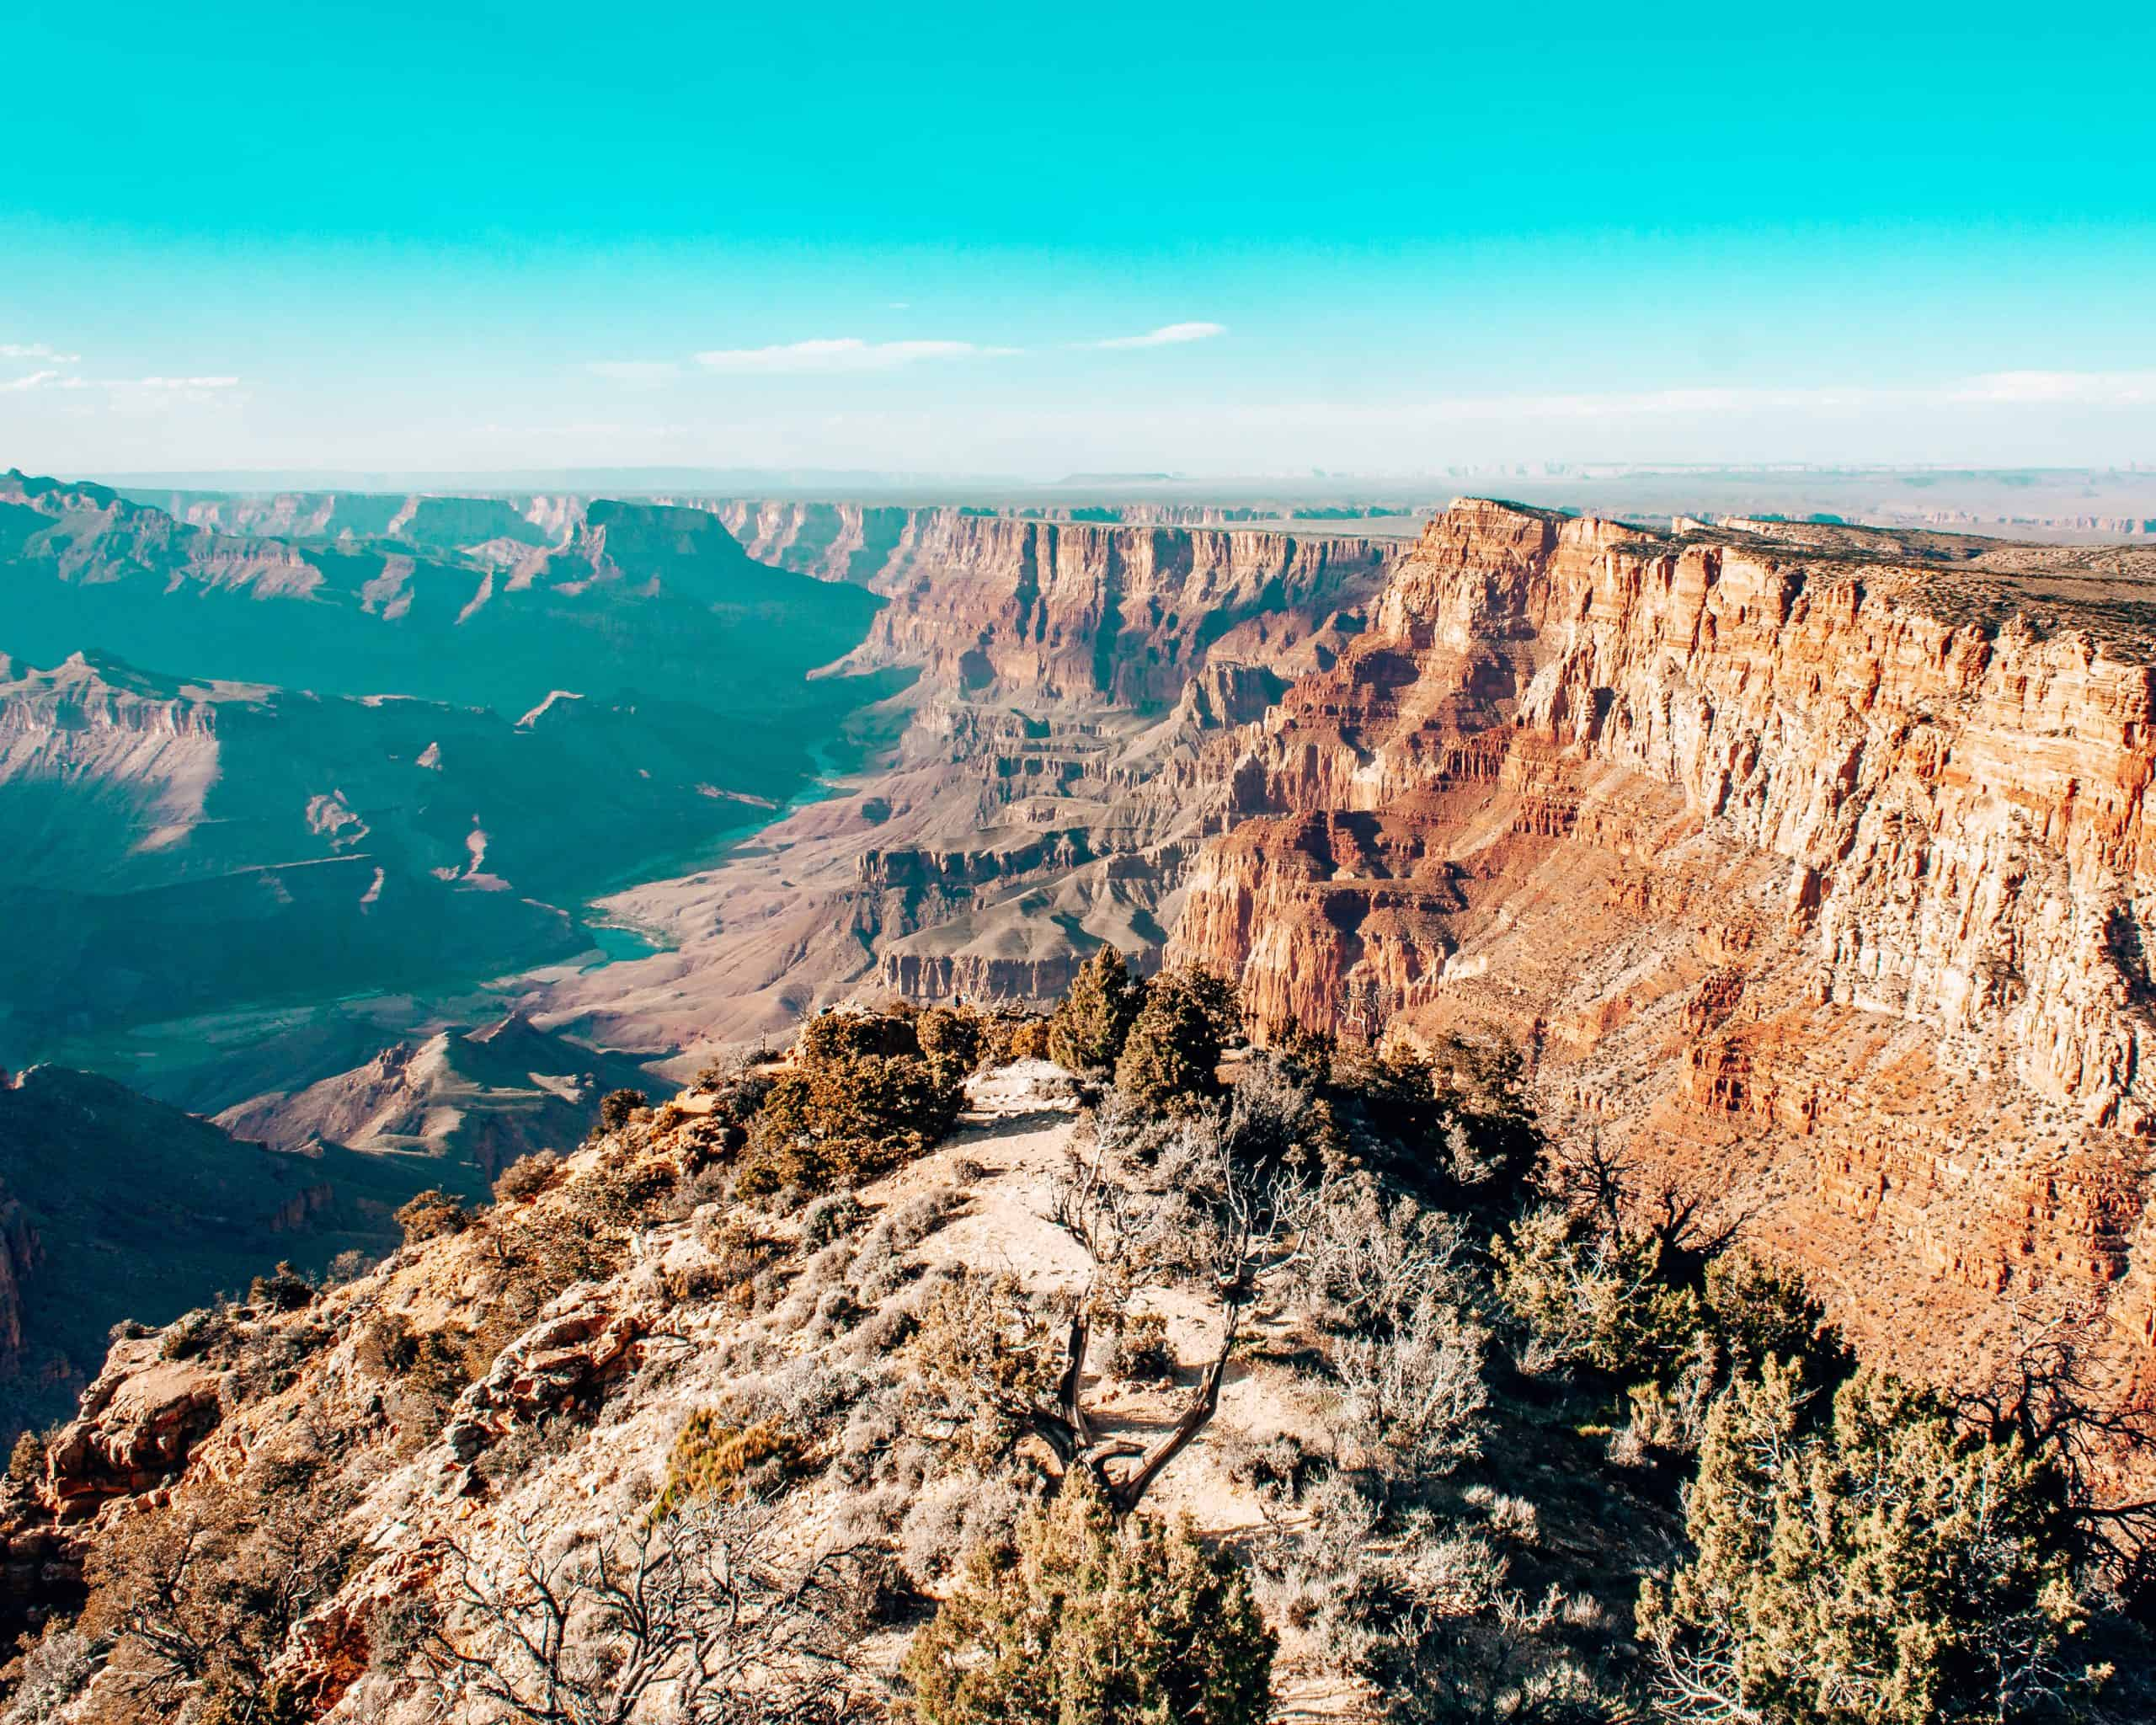 View of Grand Canyon South Rim Arizona